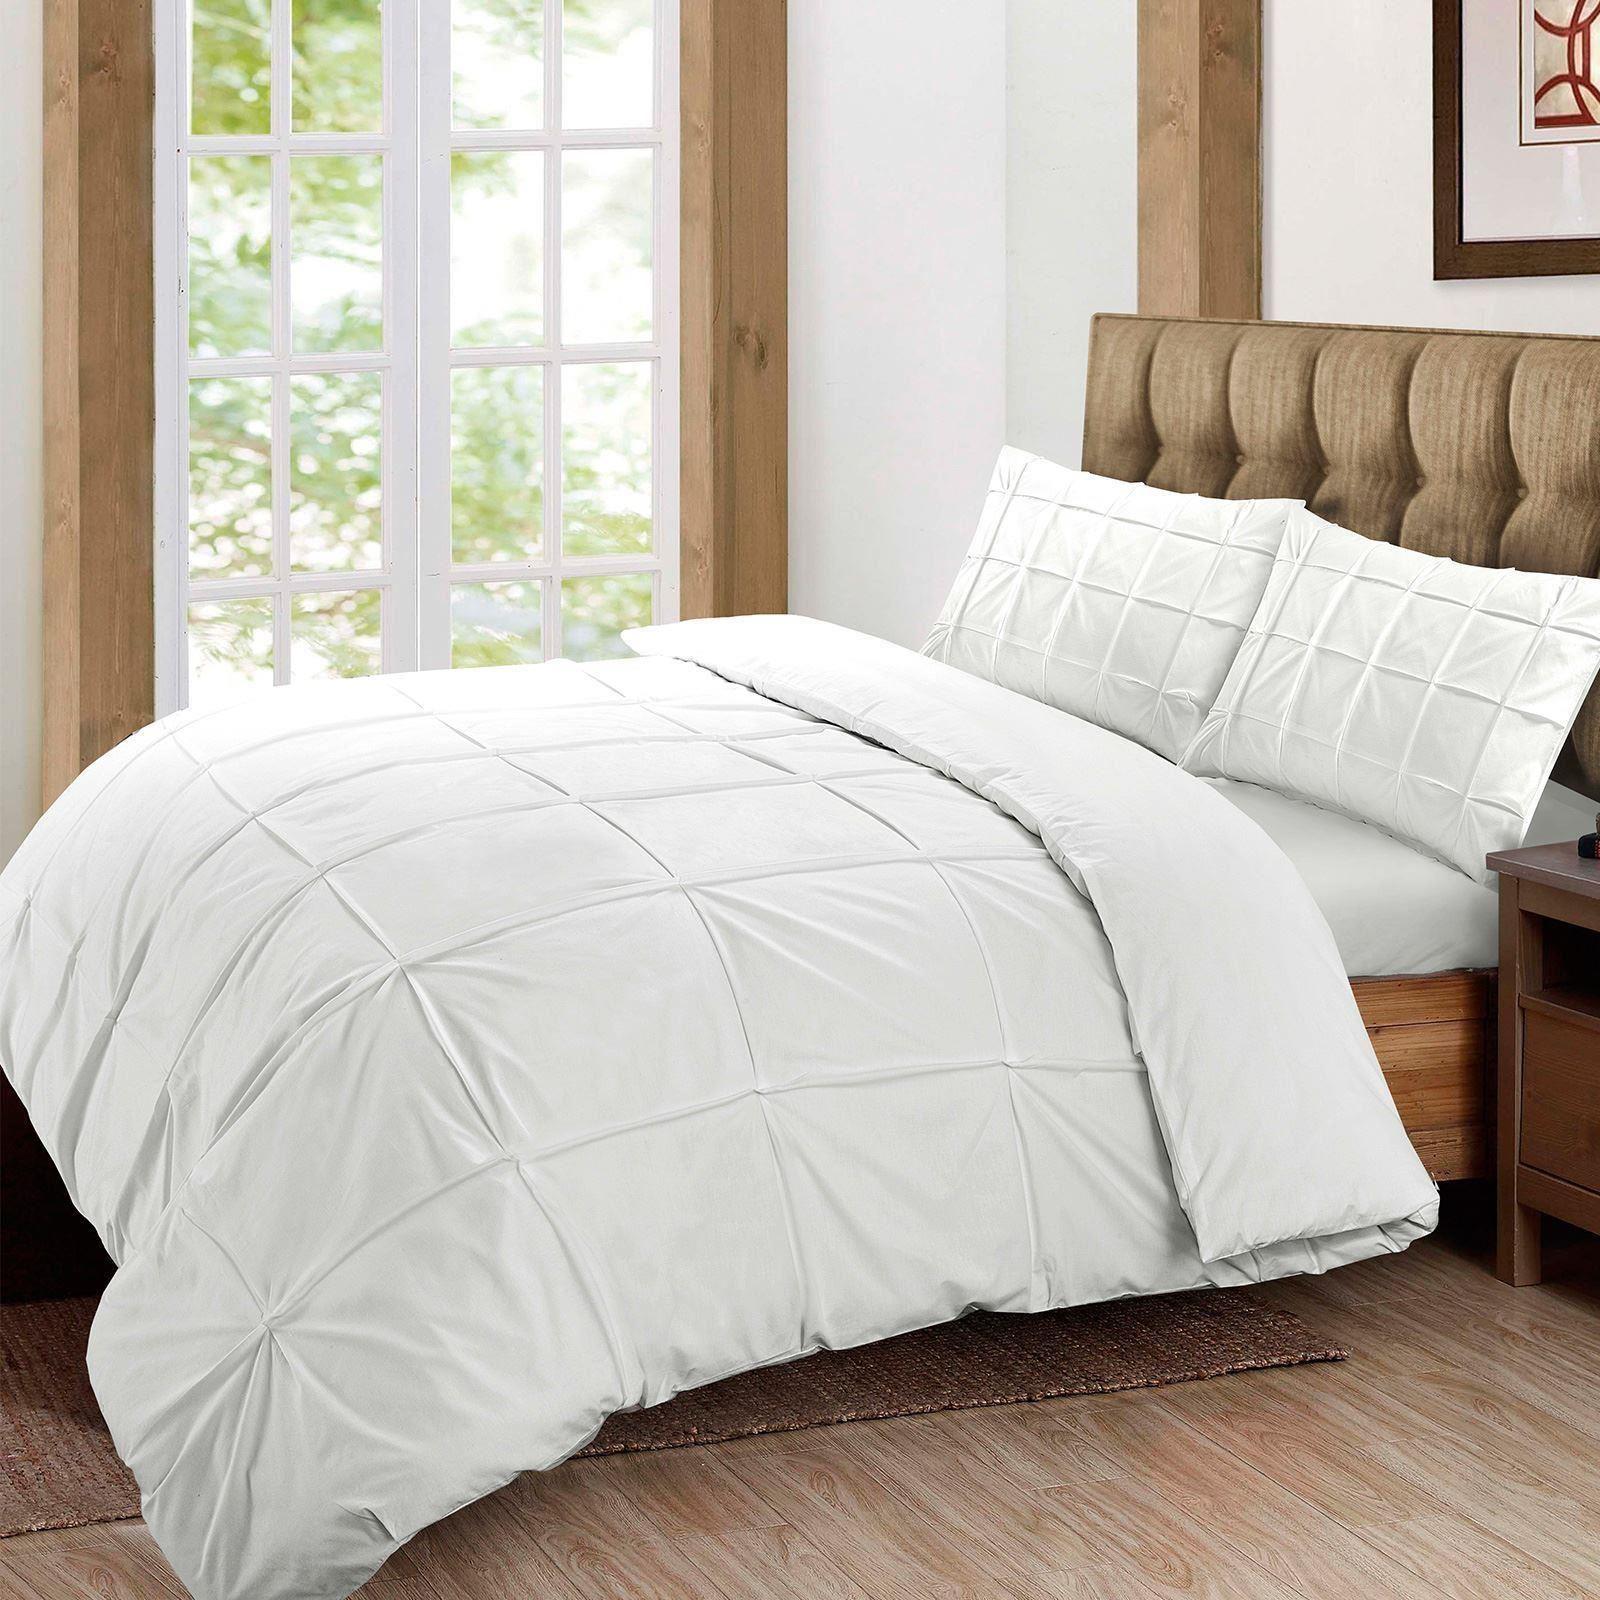 Cartier-Quilt-Duvet-Cover-Bedding-Set-Soft-100-Egyptian-Cotton-Pintuck-Pleated thumbnail 15